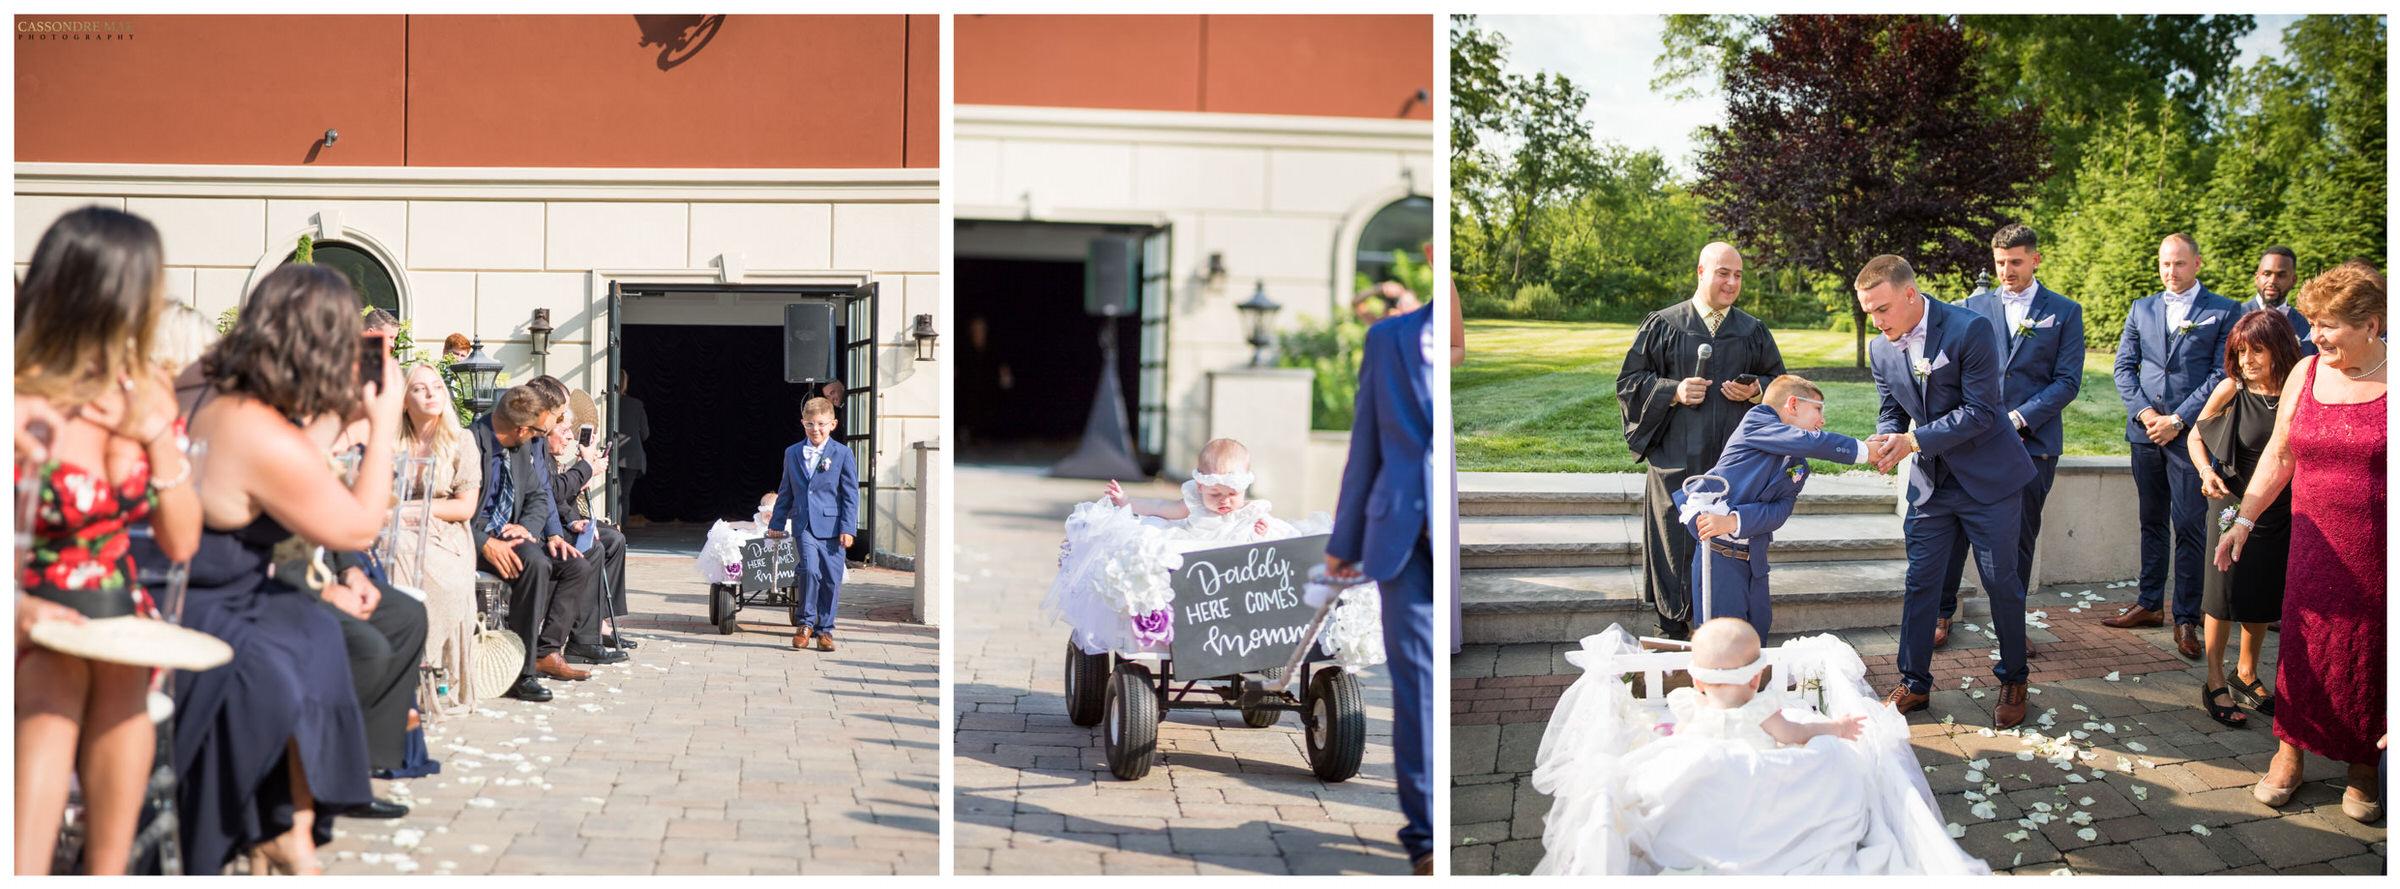 Cassondre Mae Photography Villa Venezia Wedding Photographer 9.jpg